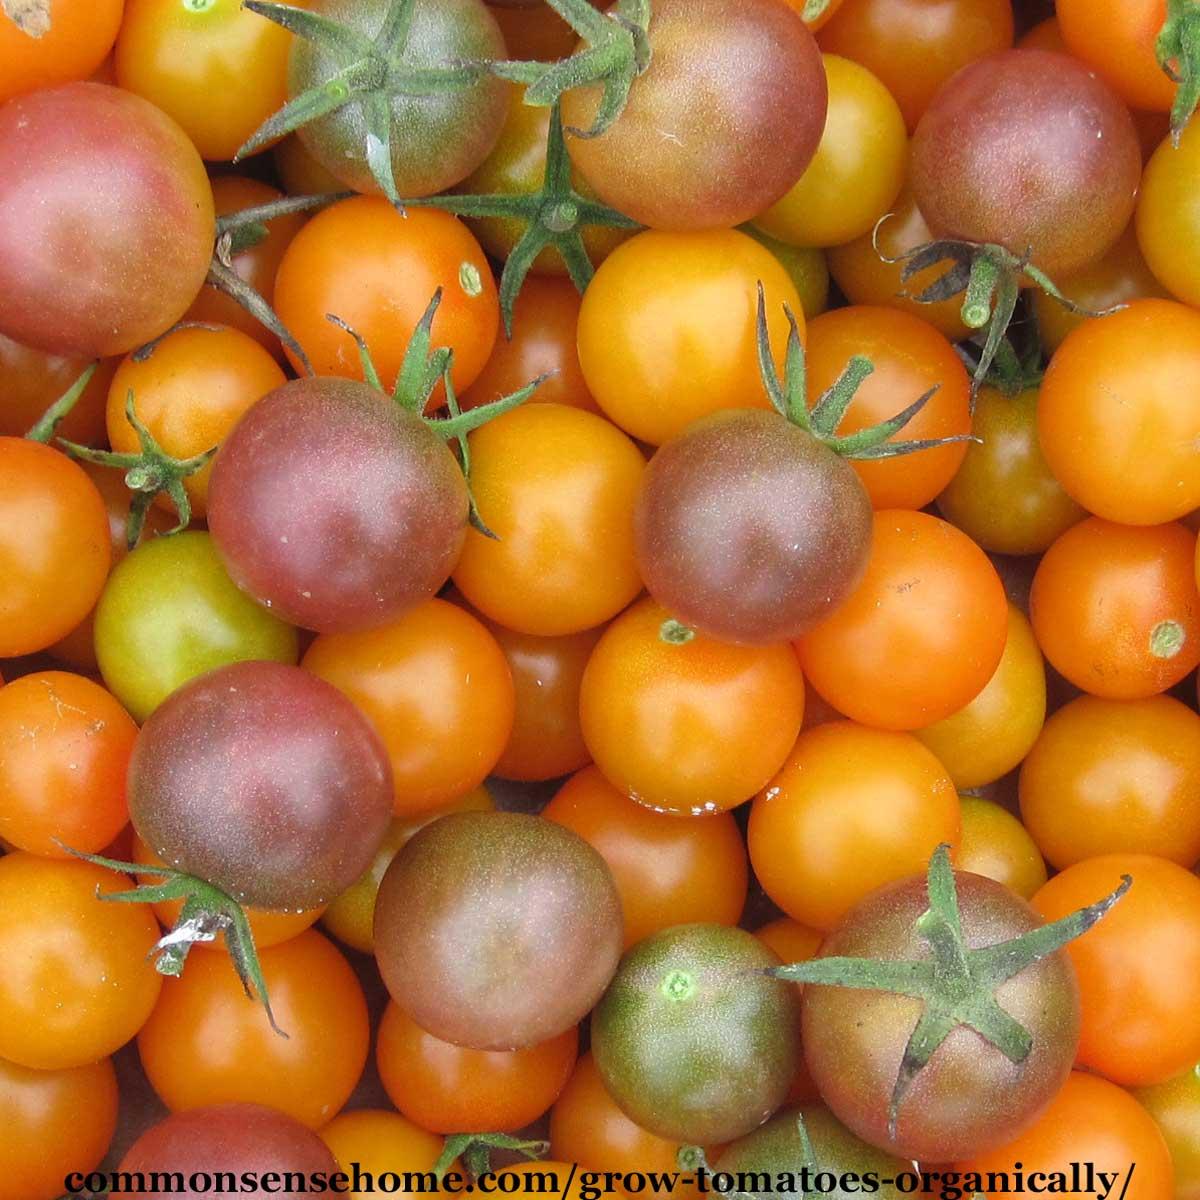 organic cherry tomatoes - sungold and black cherry